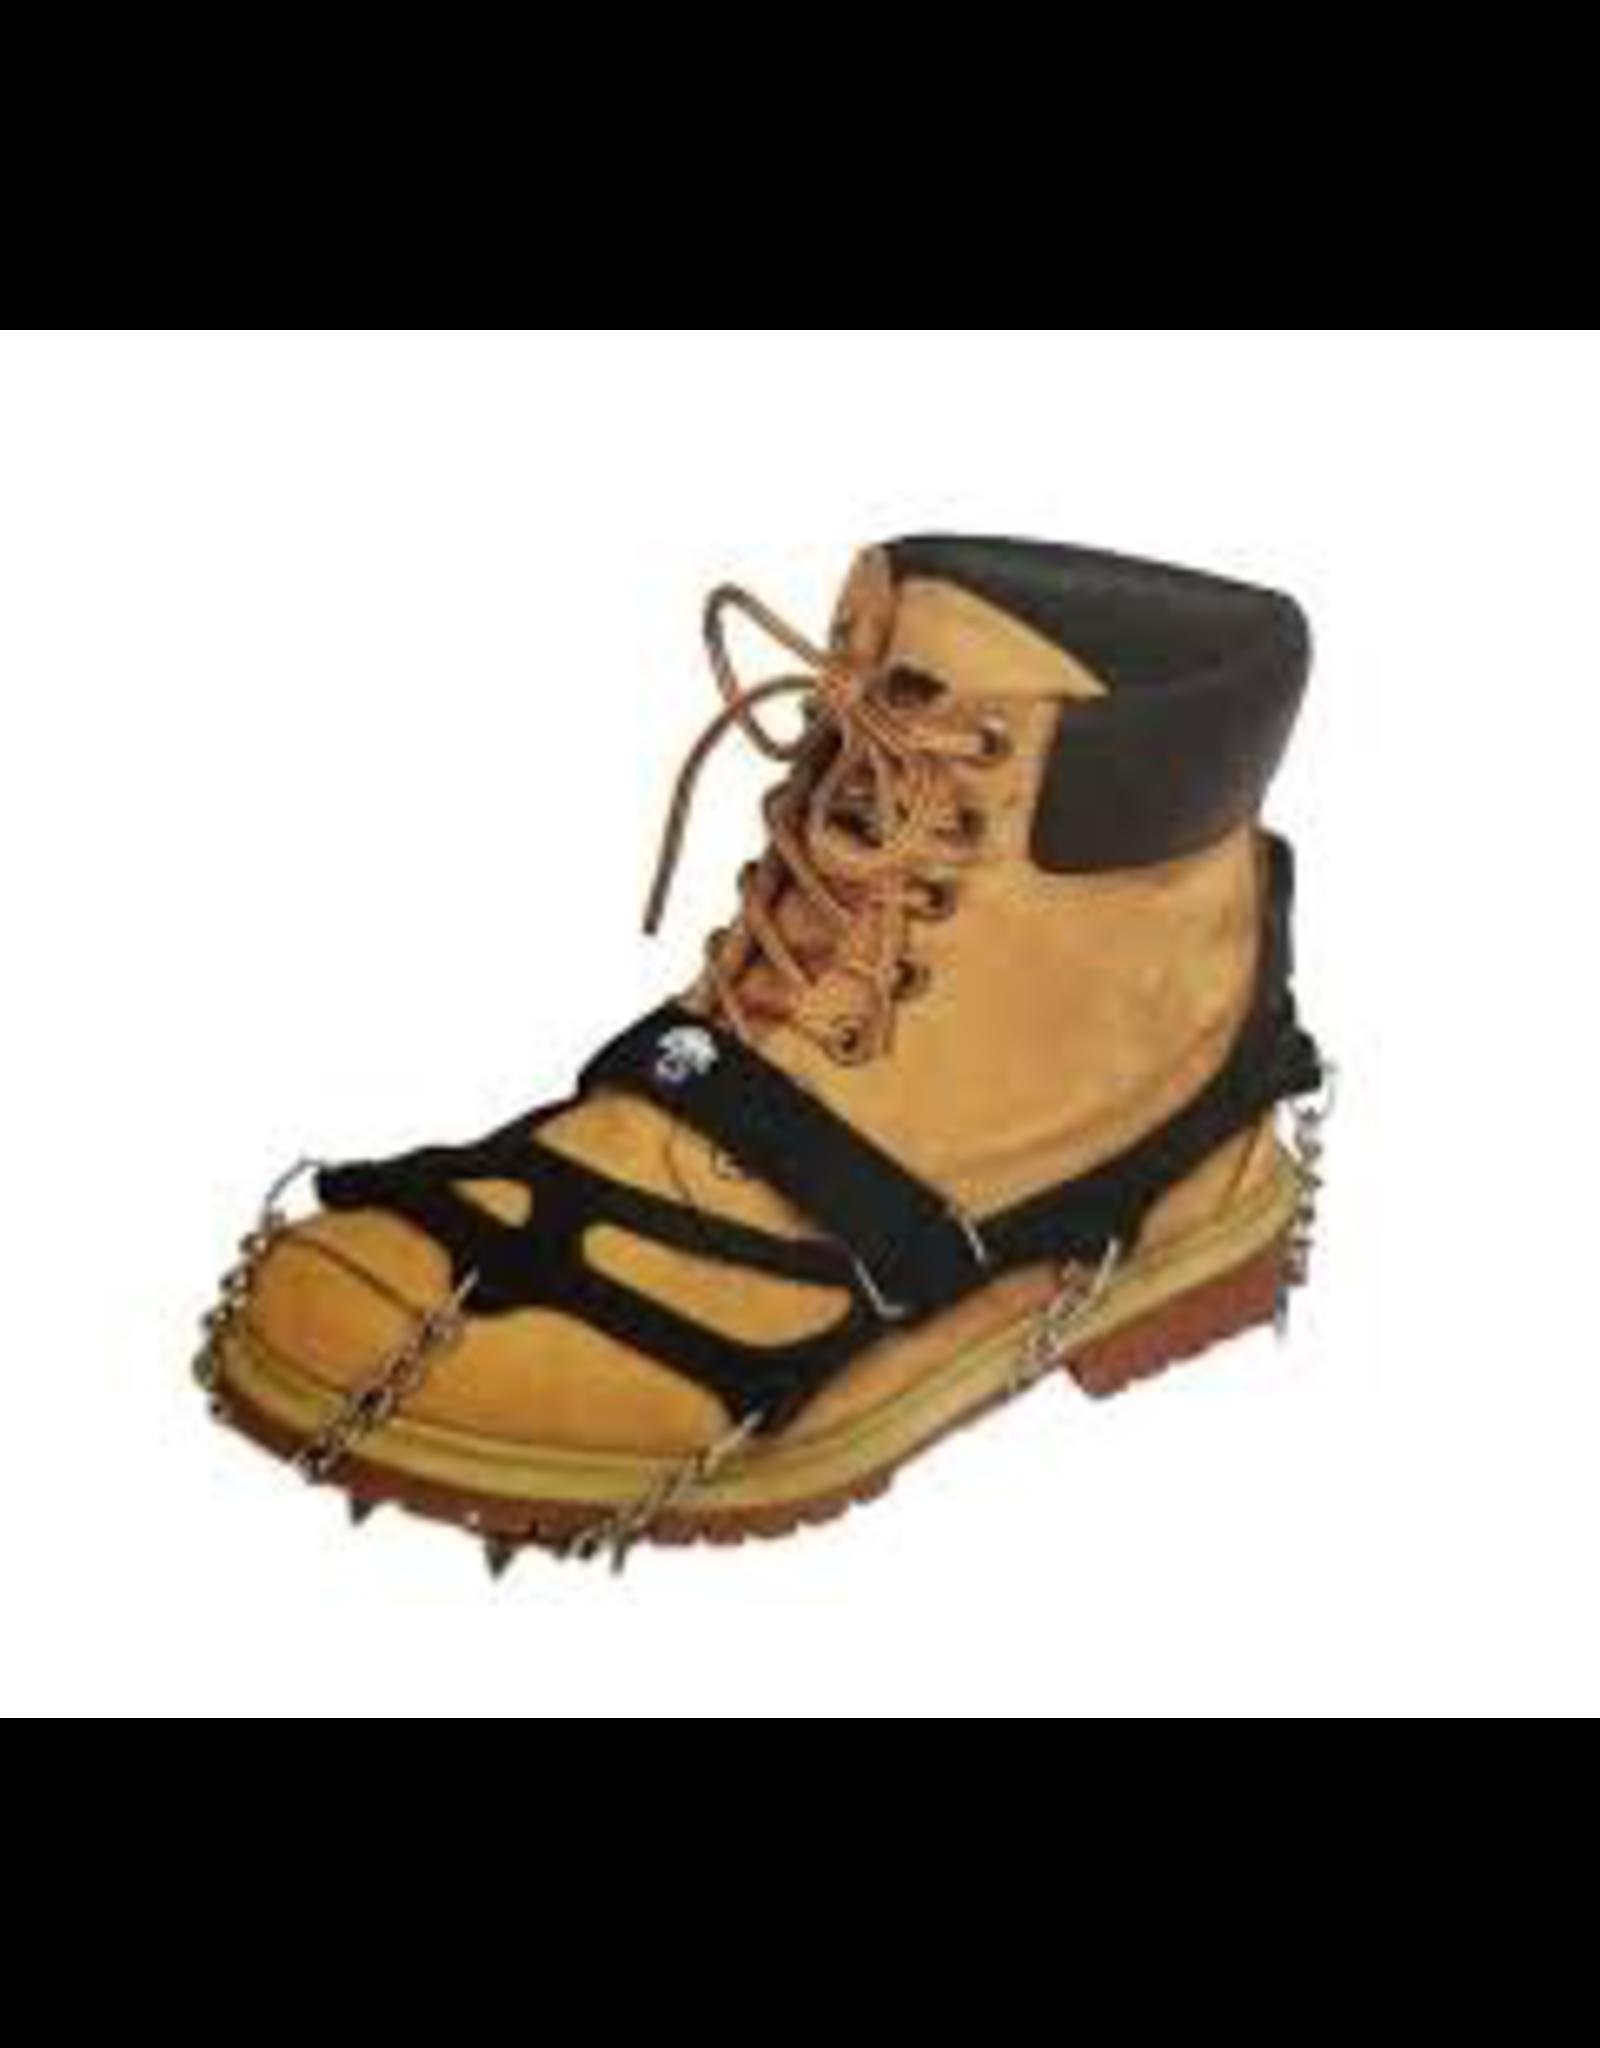 GV Snowshoes GV Icepro Crampons - Large